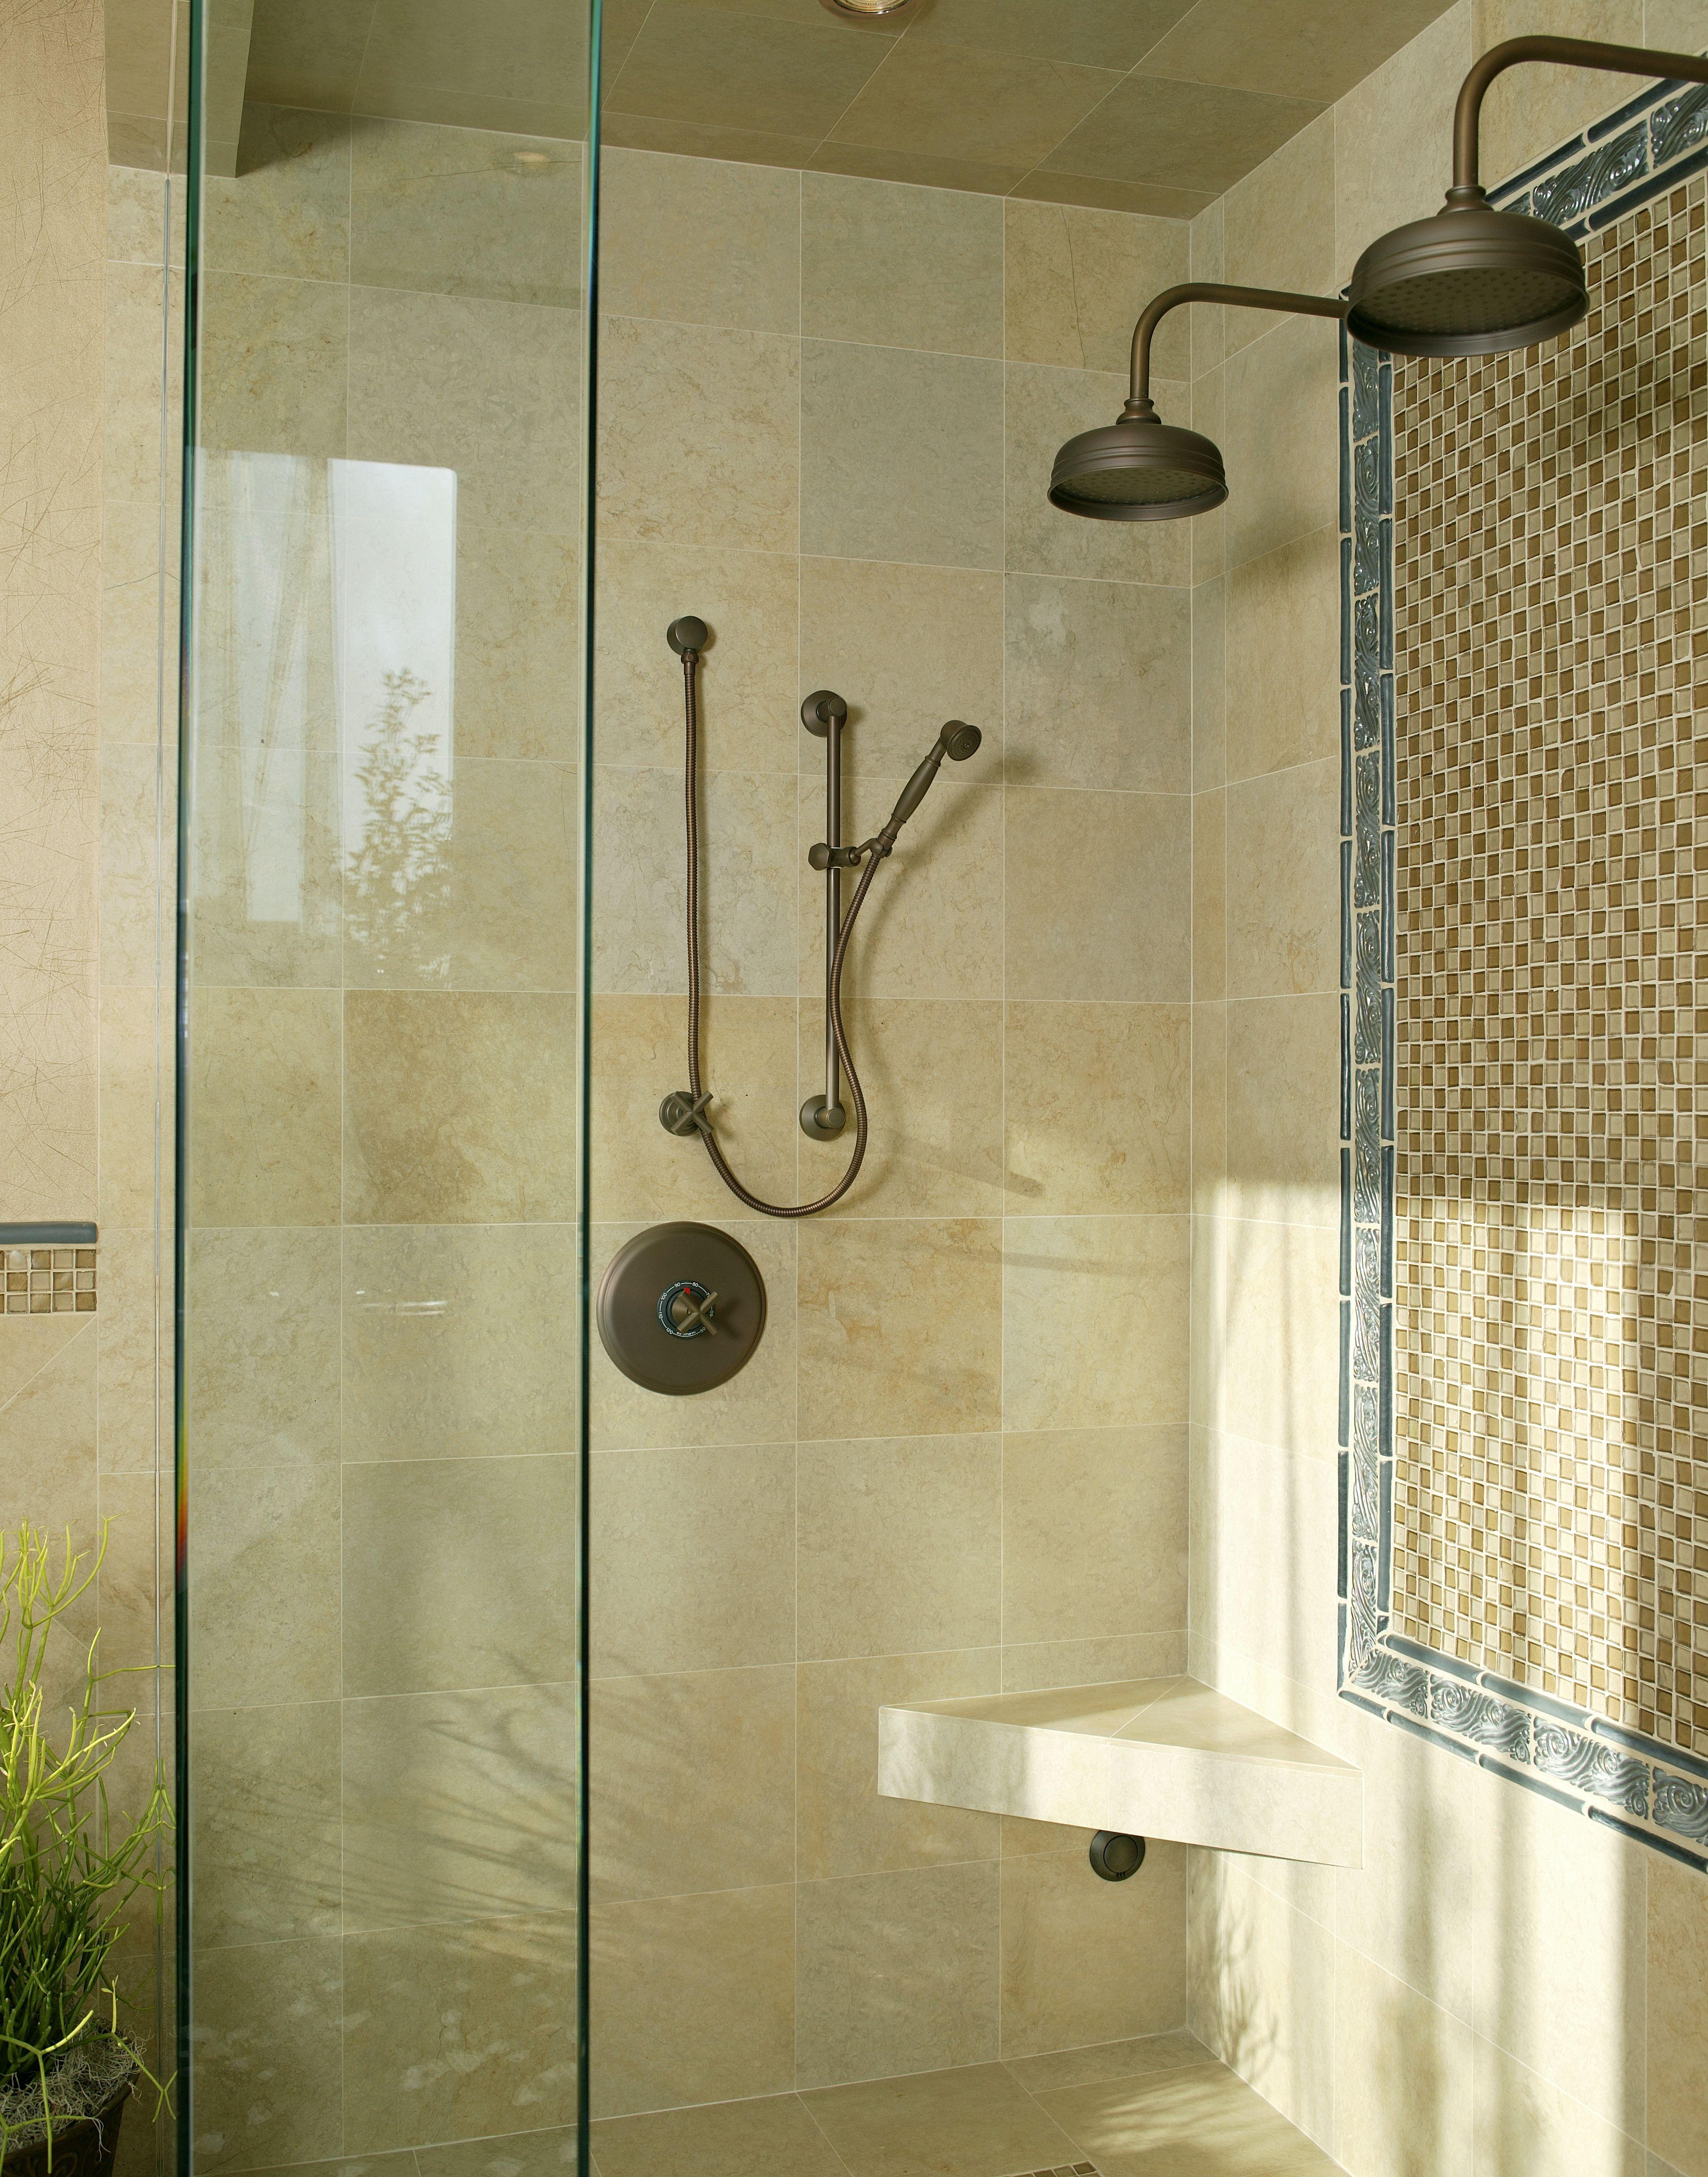 Shower Installation Cost Guide Shower Doors Tiles Pumps Etc In 2020 Glass Shower Wall Shower Wall Panels Shower Wall